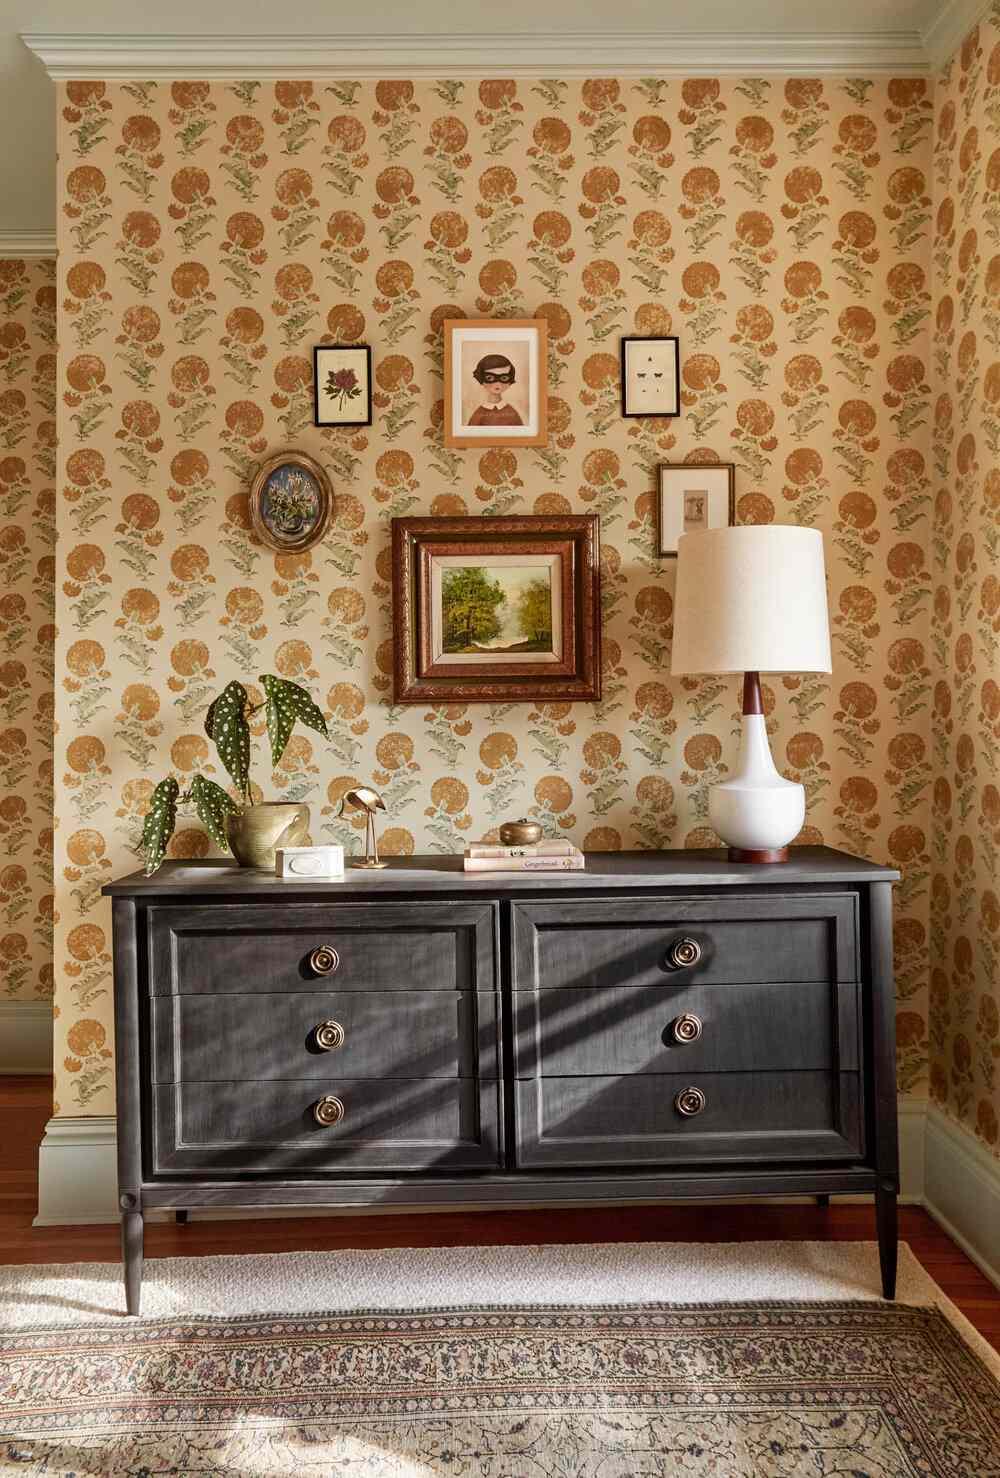 Rustic nursery with wallpaper